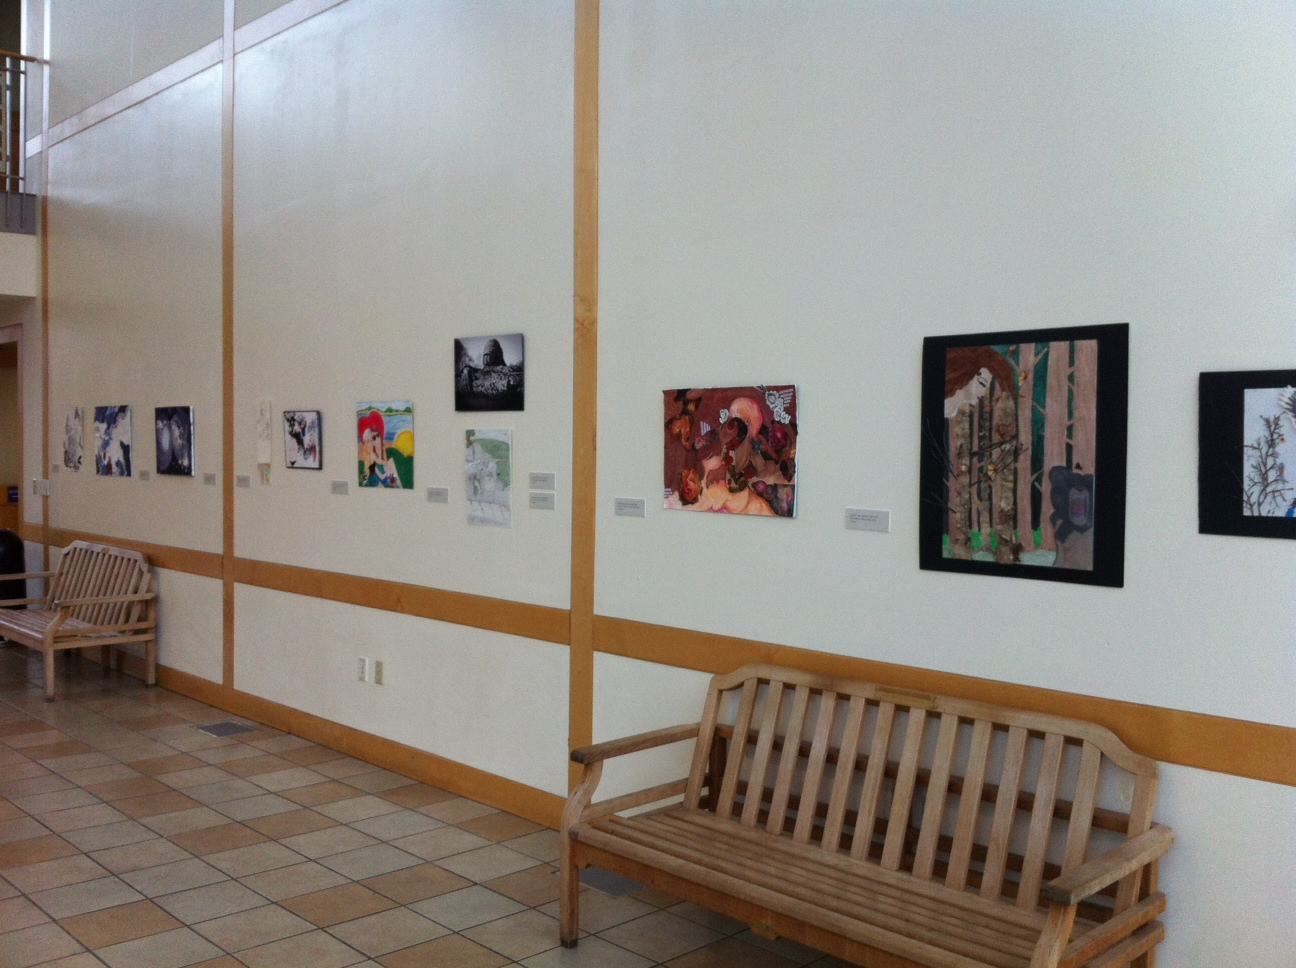 Loop Project Exhibited at Cheekwood